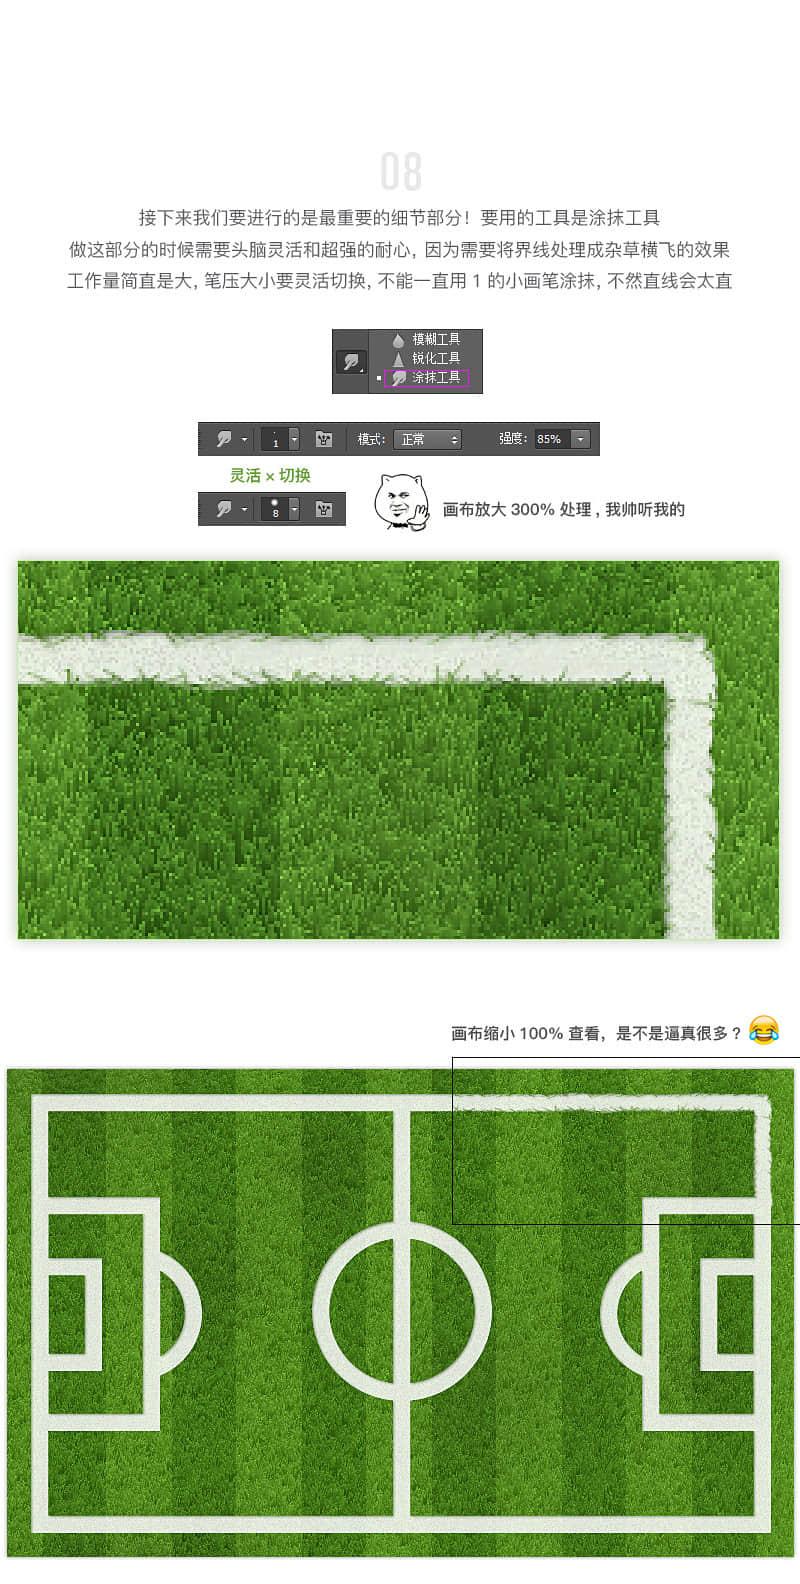 Photoshop无中生有制作绿茵草坪教程